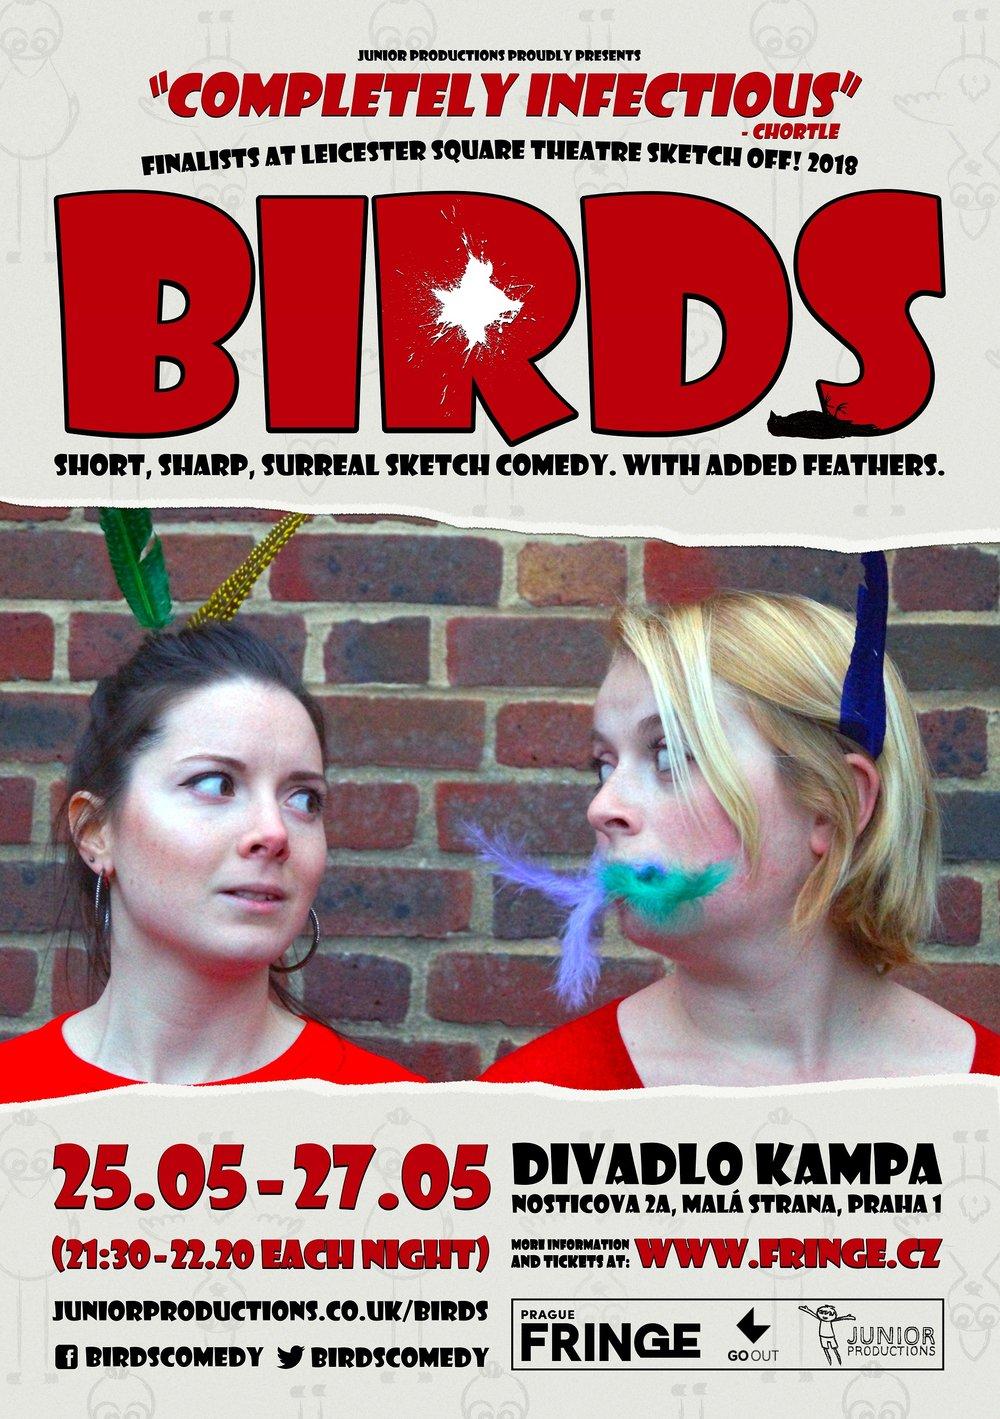 Official Prague Fringe Poster for Birds